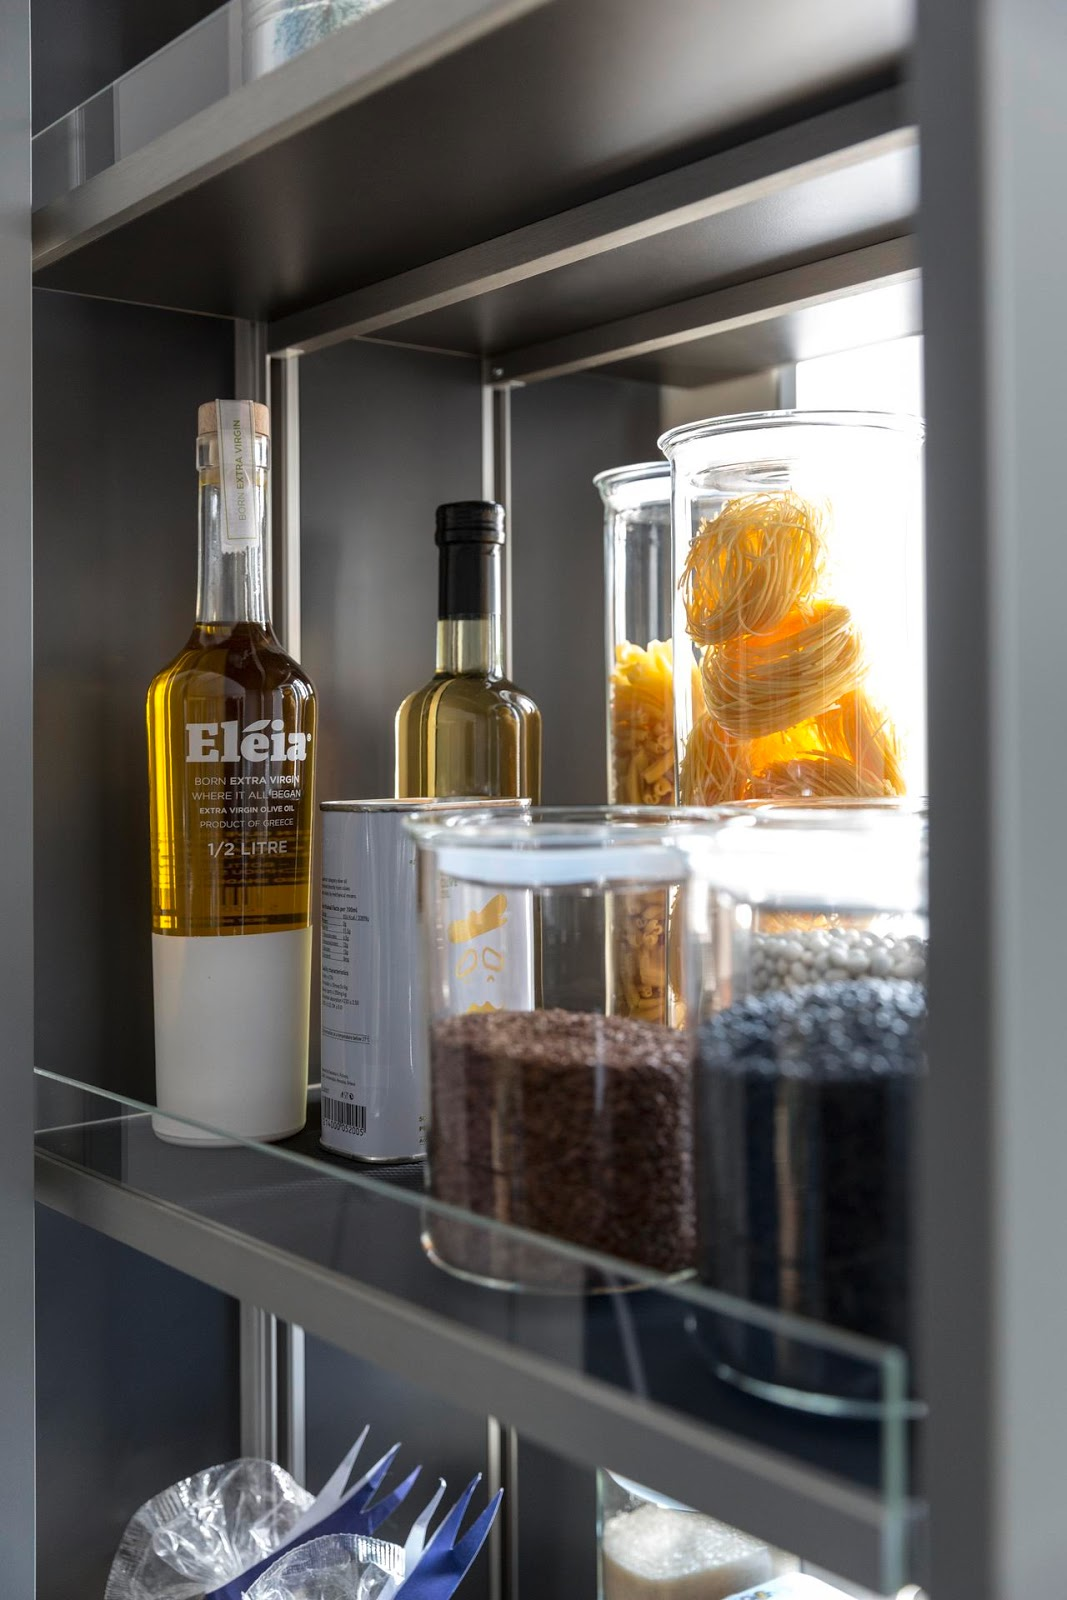 wysuwane szafki w kuchni